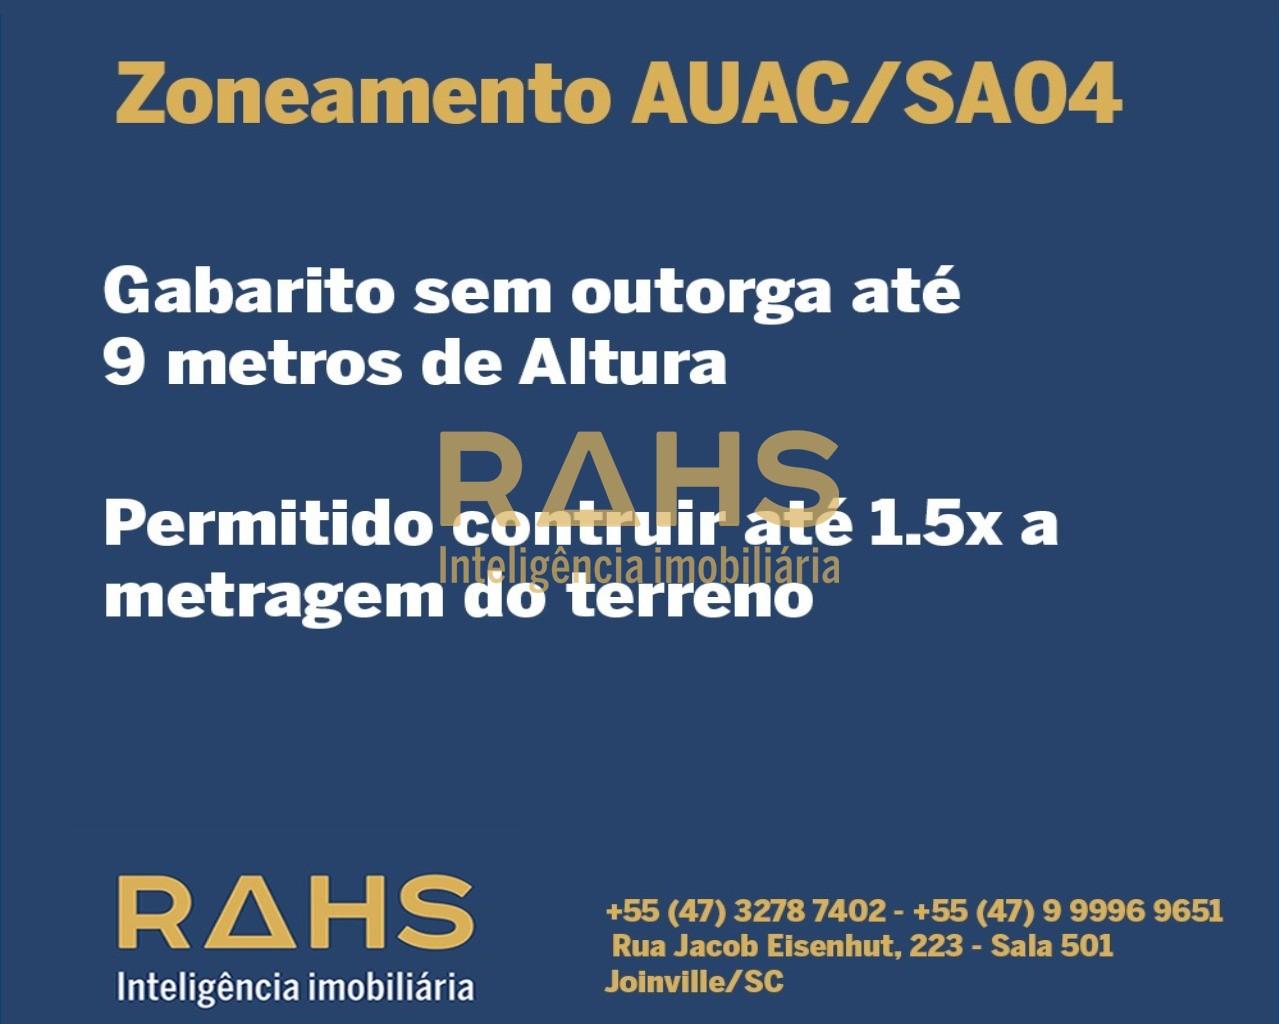 https://s3-sa-east-1.amazonaws.com/grupo-union/20655/2021/09/220c8b5d718f02933be122edfd676194.jpg